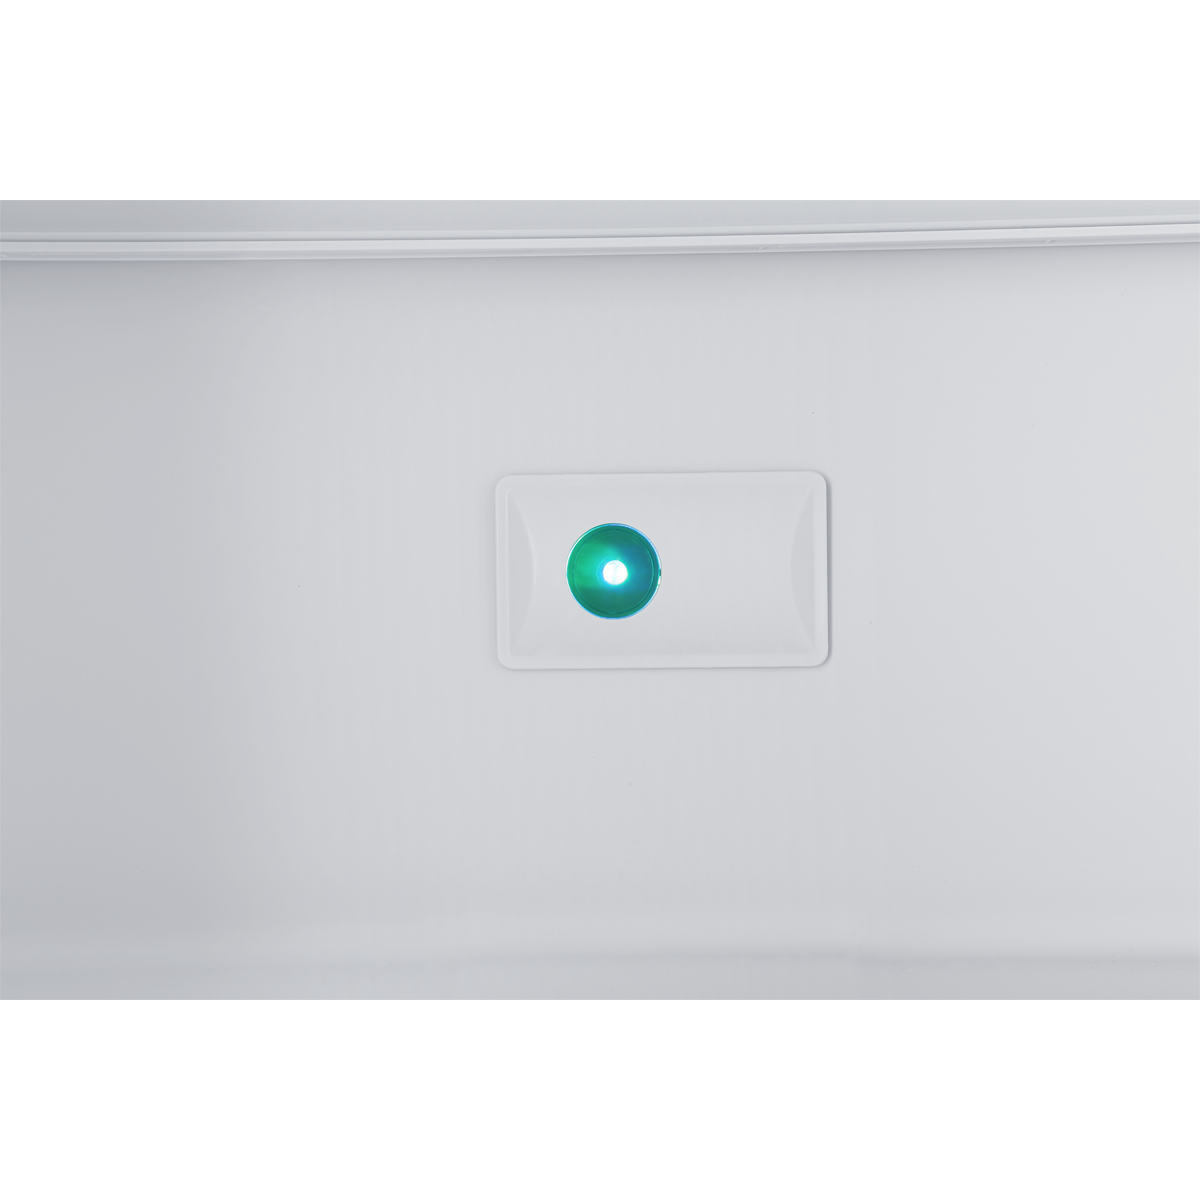 海尔冰箱 bcd-228wsv